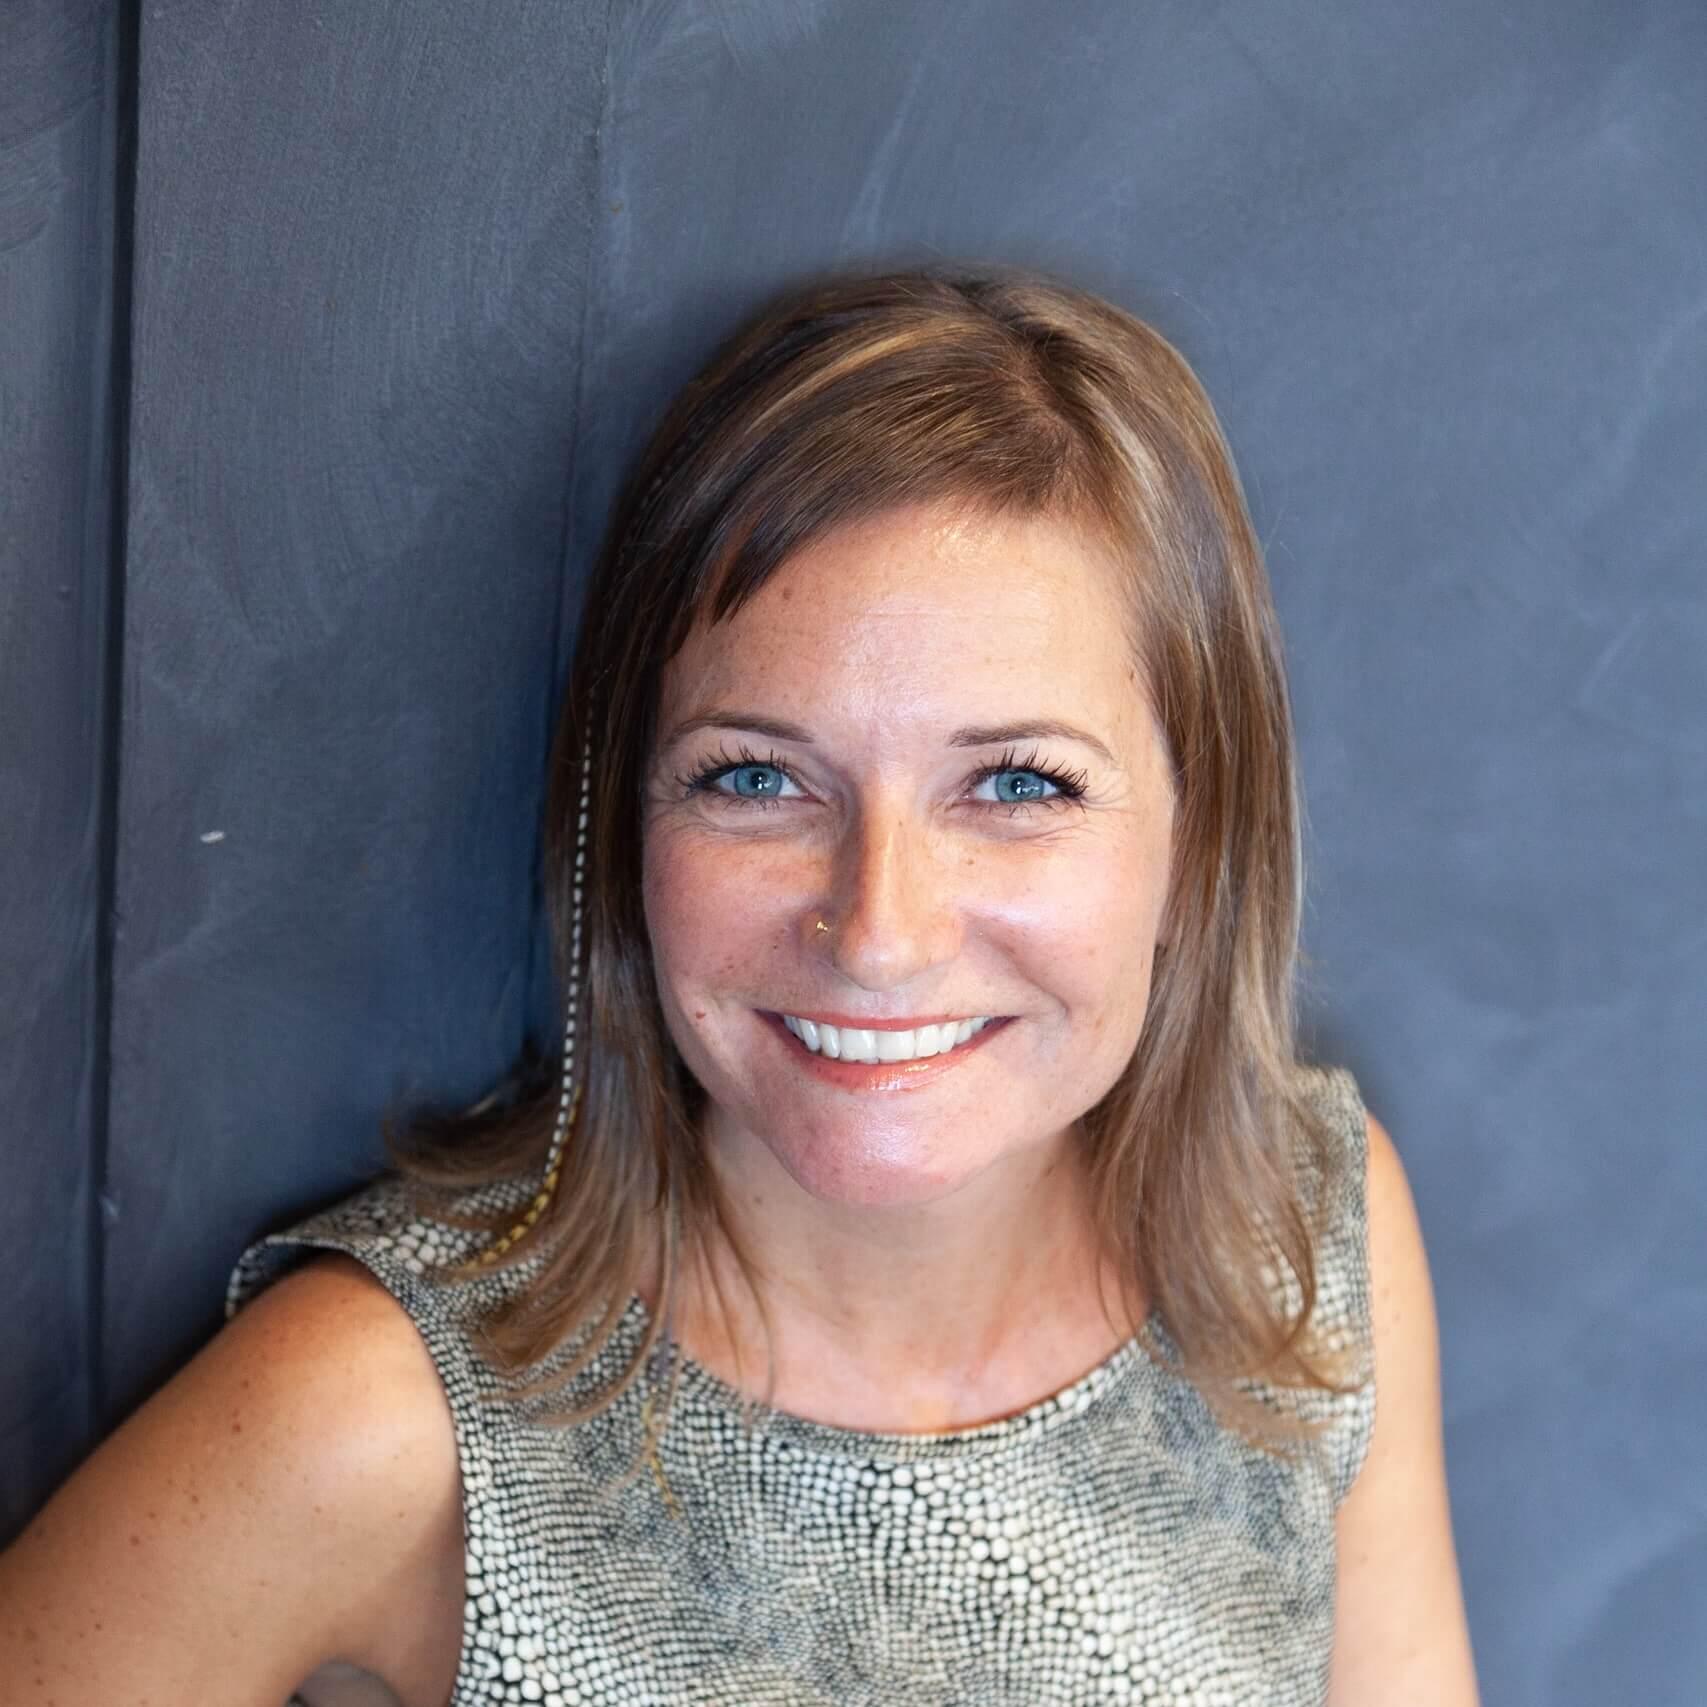 Stefanie Logemann | SMART IBIS VIRTUELLE ASSISTENZ & WEBDESIGN